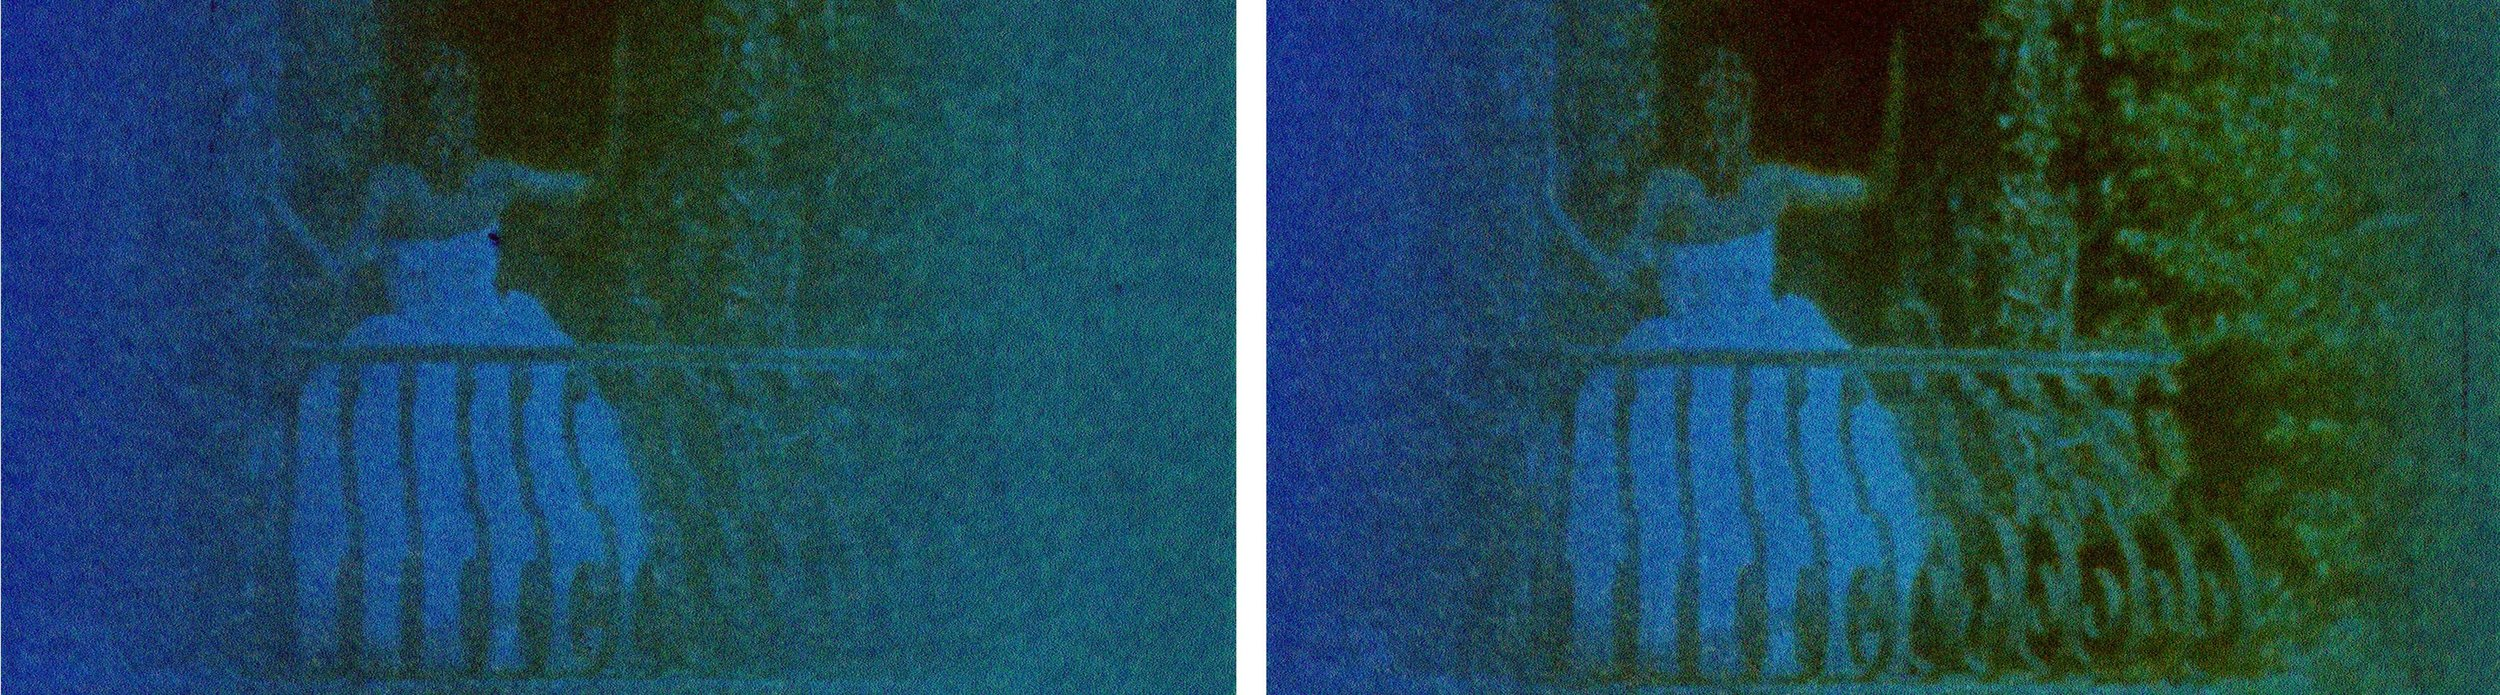 Catherine Sullivan, Triangle of need,  2008, «SVEMA TSO-50A 8 MM #1 », two C-Print, 24 x 40 inches (each image) / 60,96 x 101.6 cm